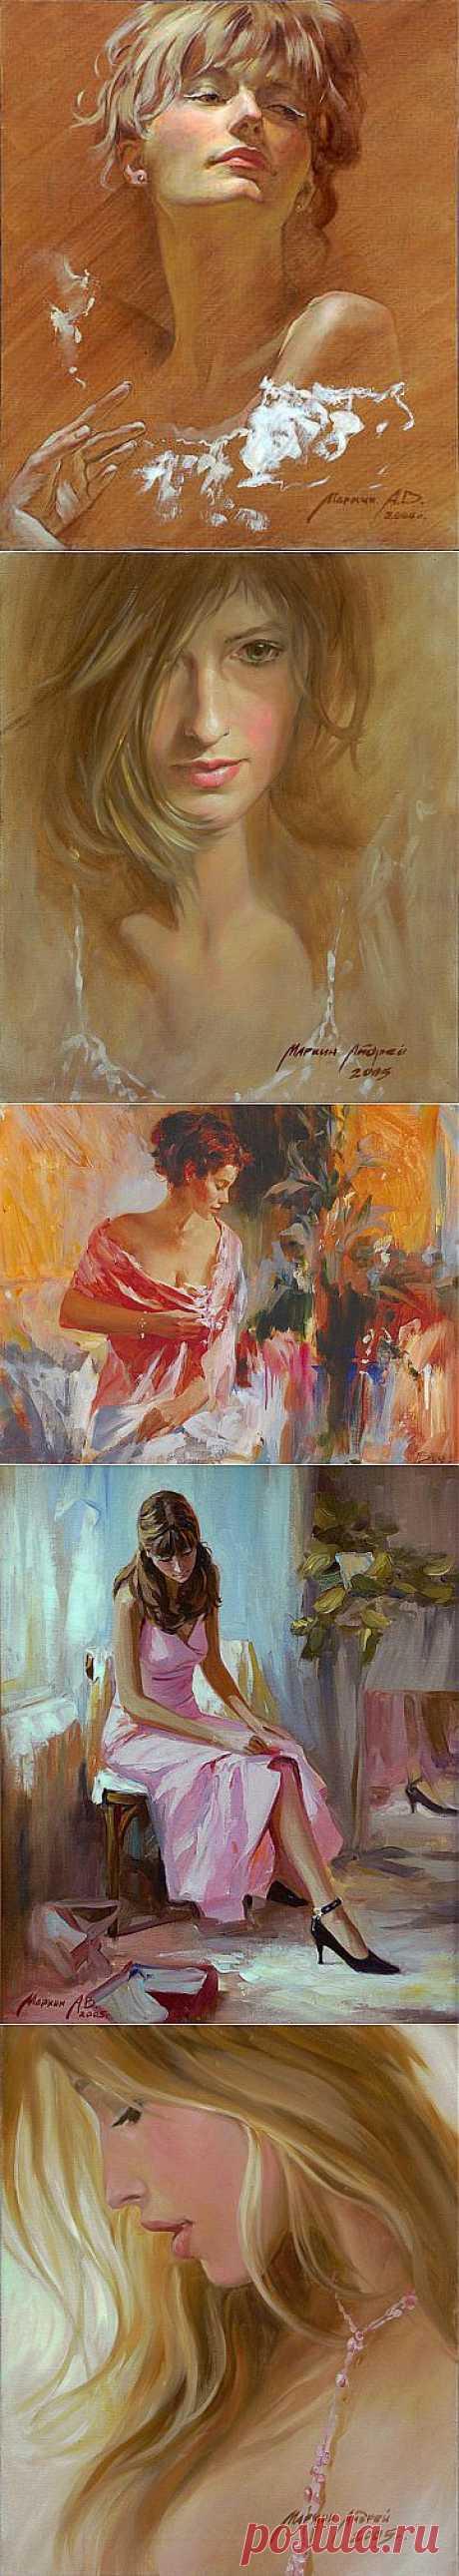 Андрей Маркин (Andrei Markin) | Art&Tatucya